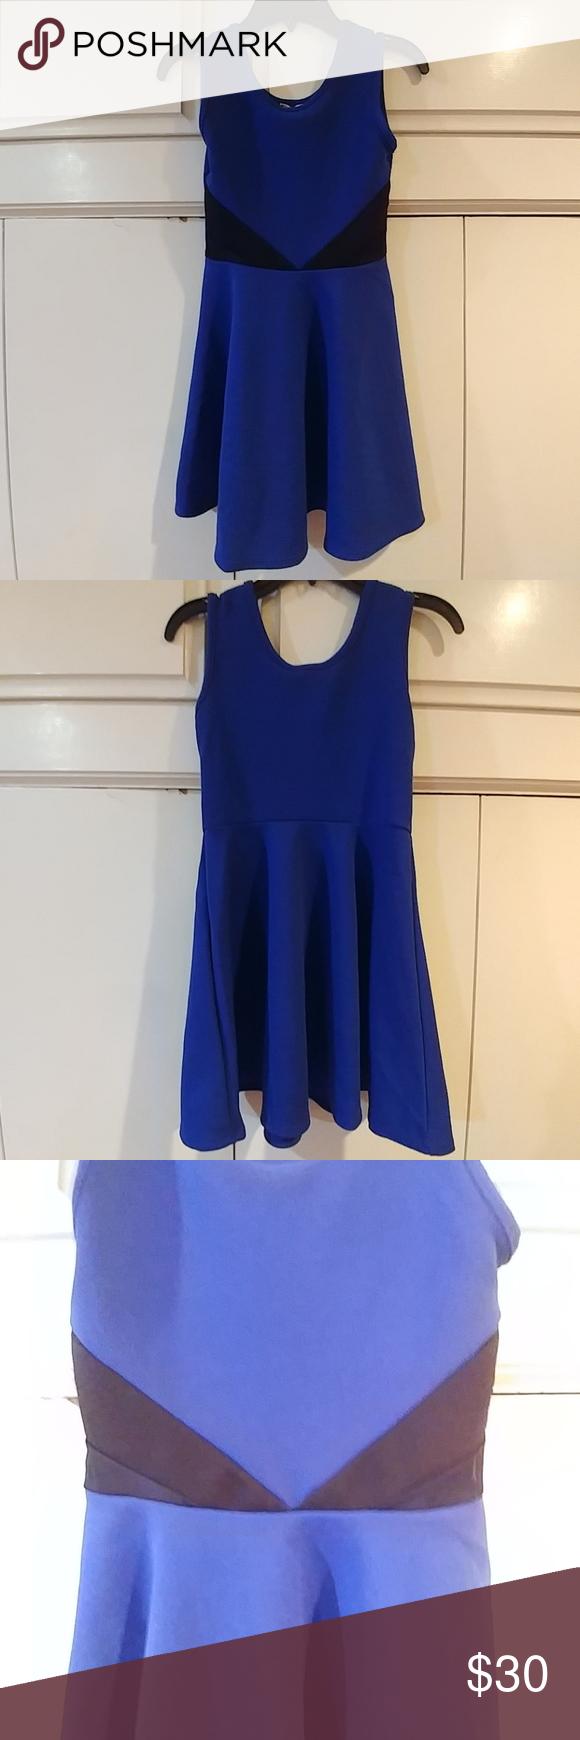 Sally Miller Saffire Blue & Black Dress Saffire Blue dress, with black accents at the waist. Pullover style. NWT Sally Miller Dresses Casual #sallymiller